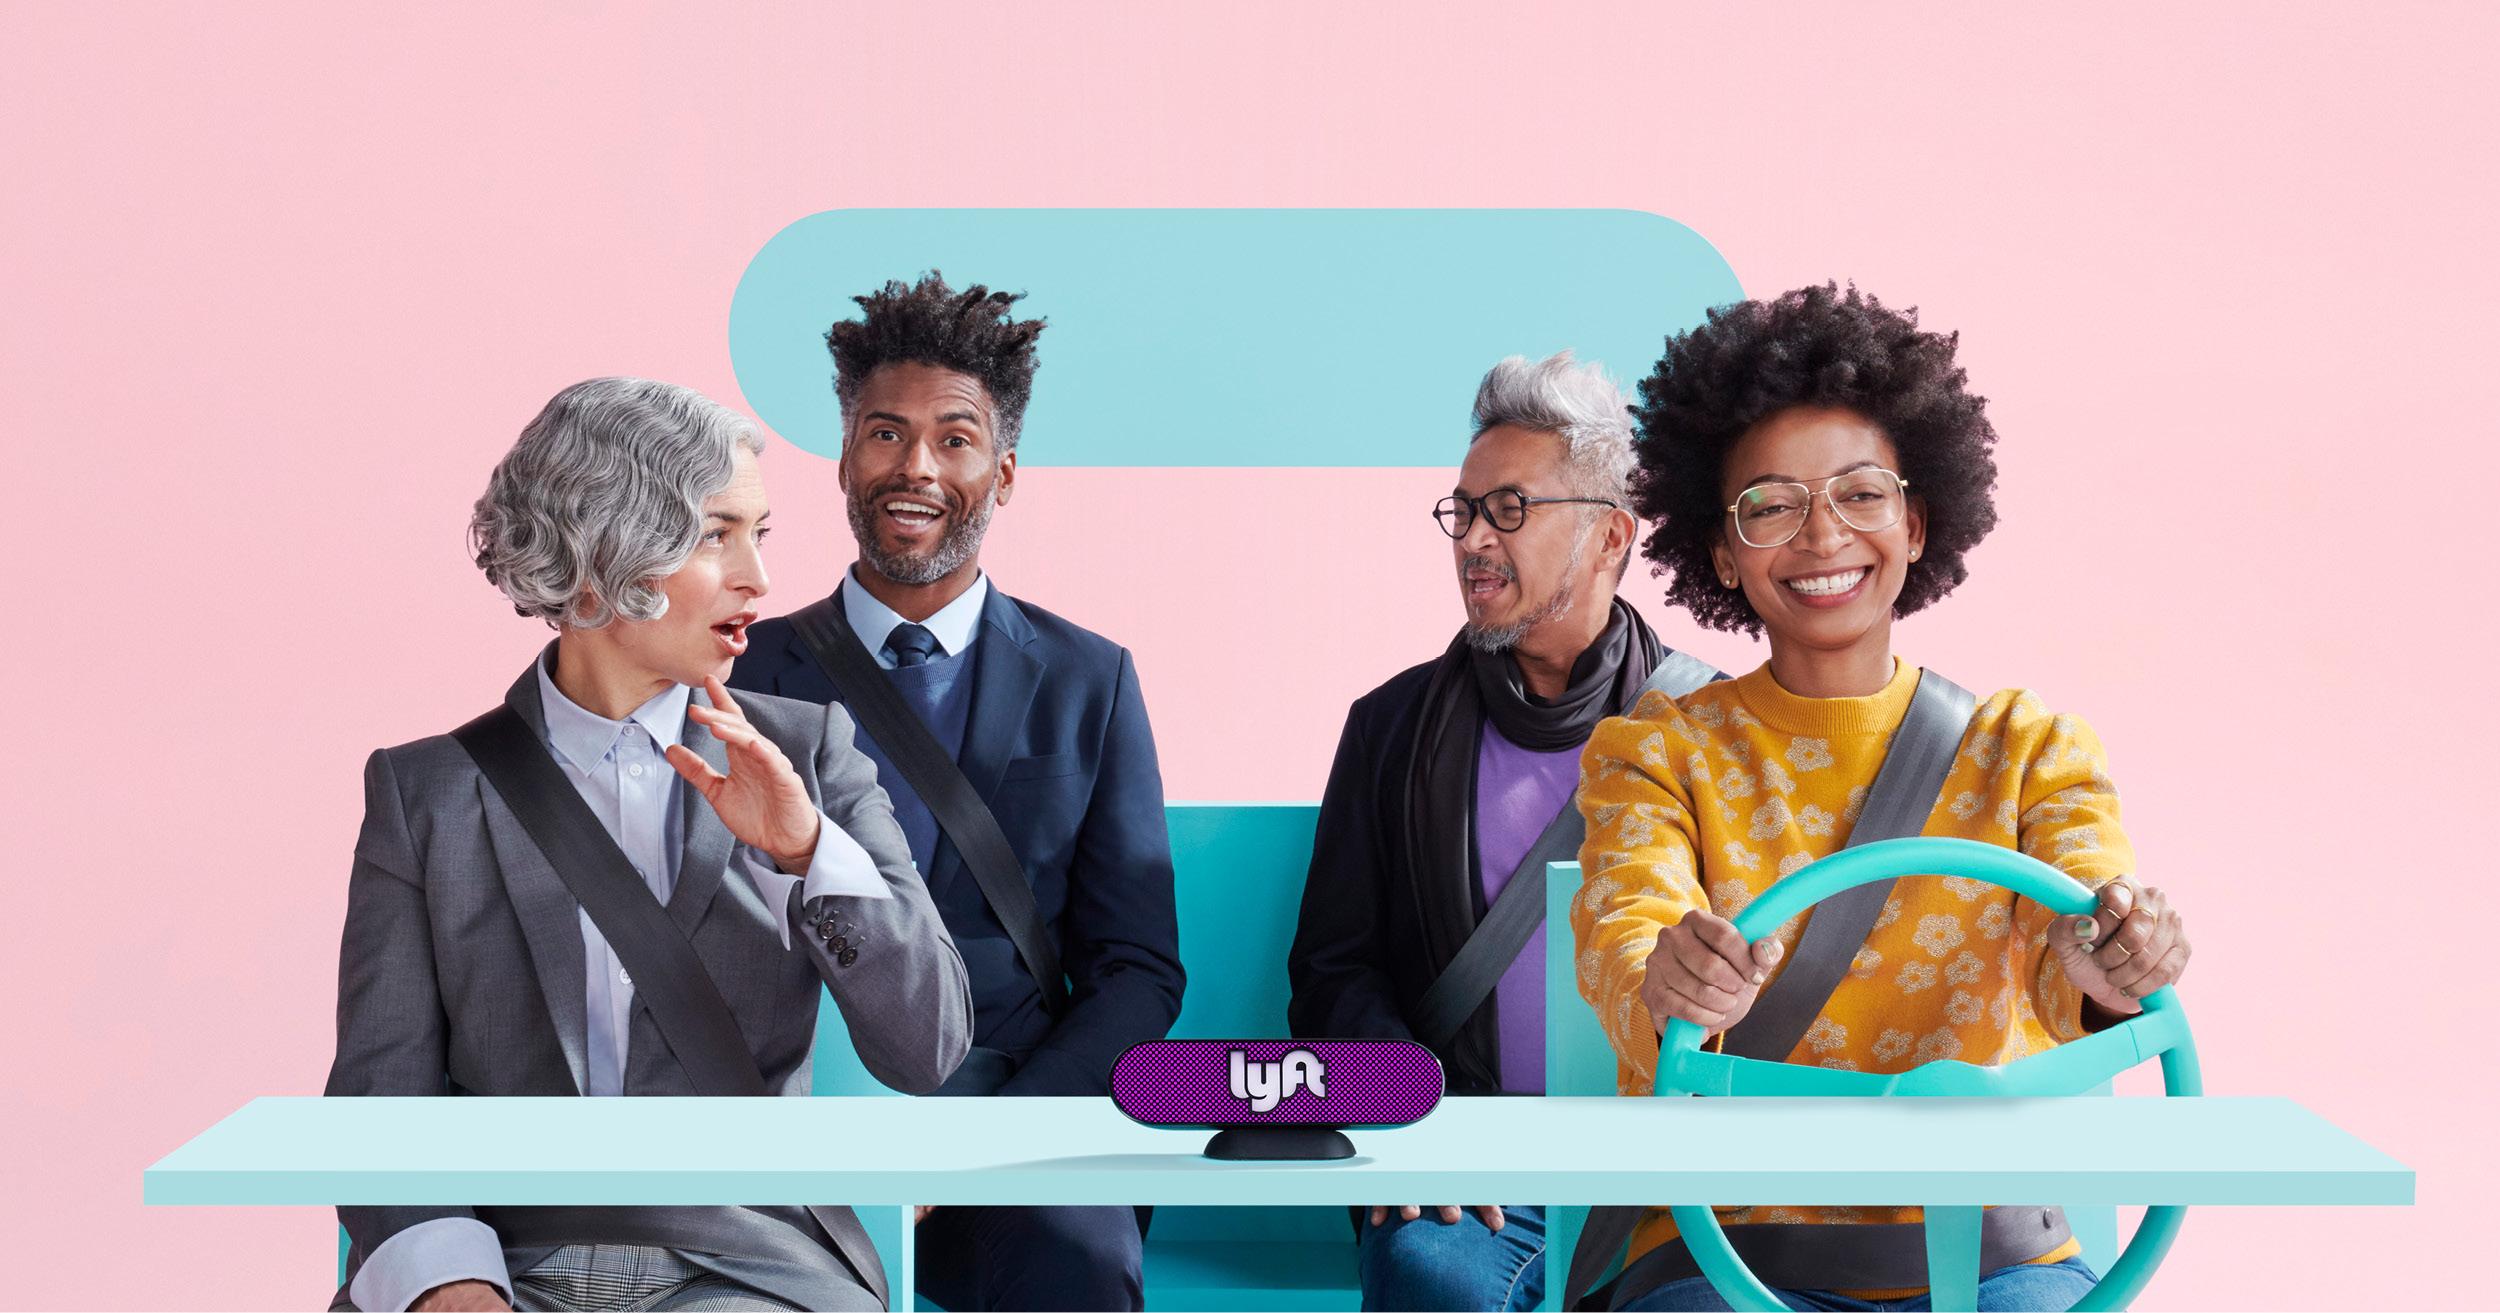 Four people in a make-believe Lyft vehicle.